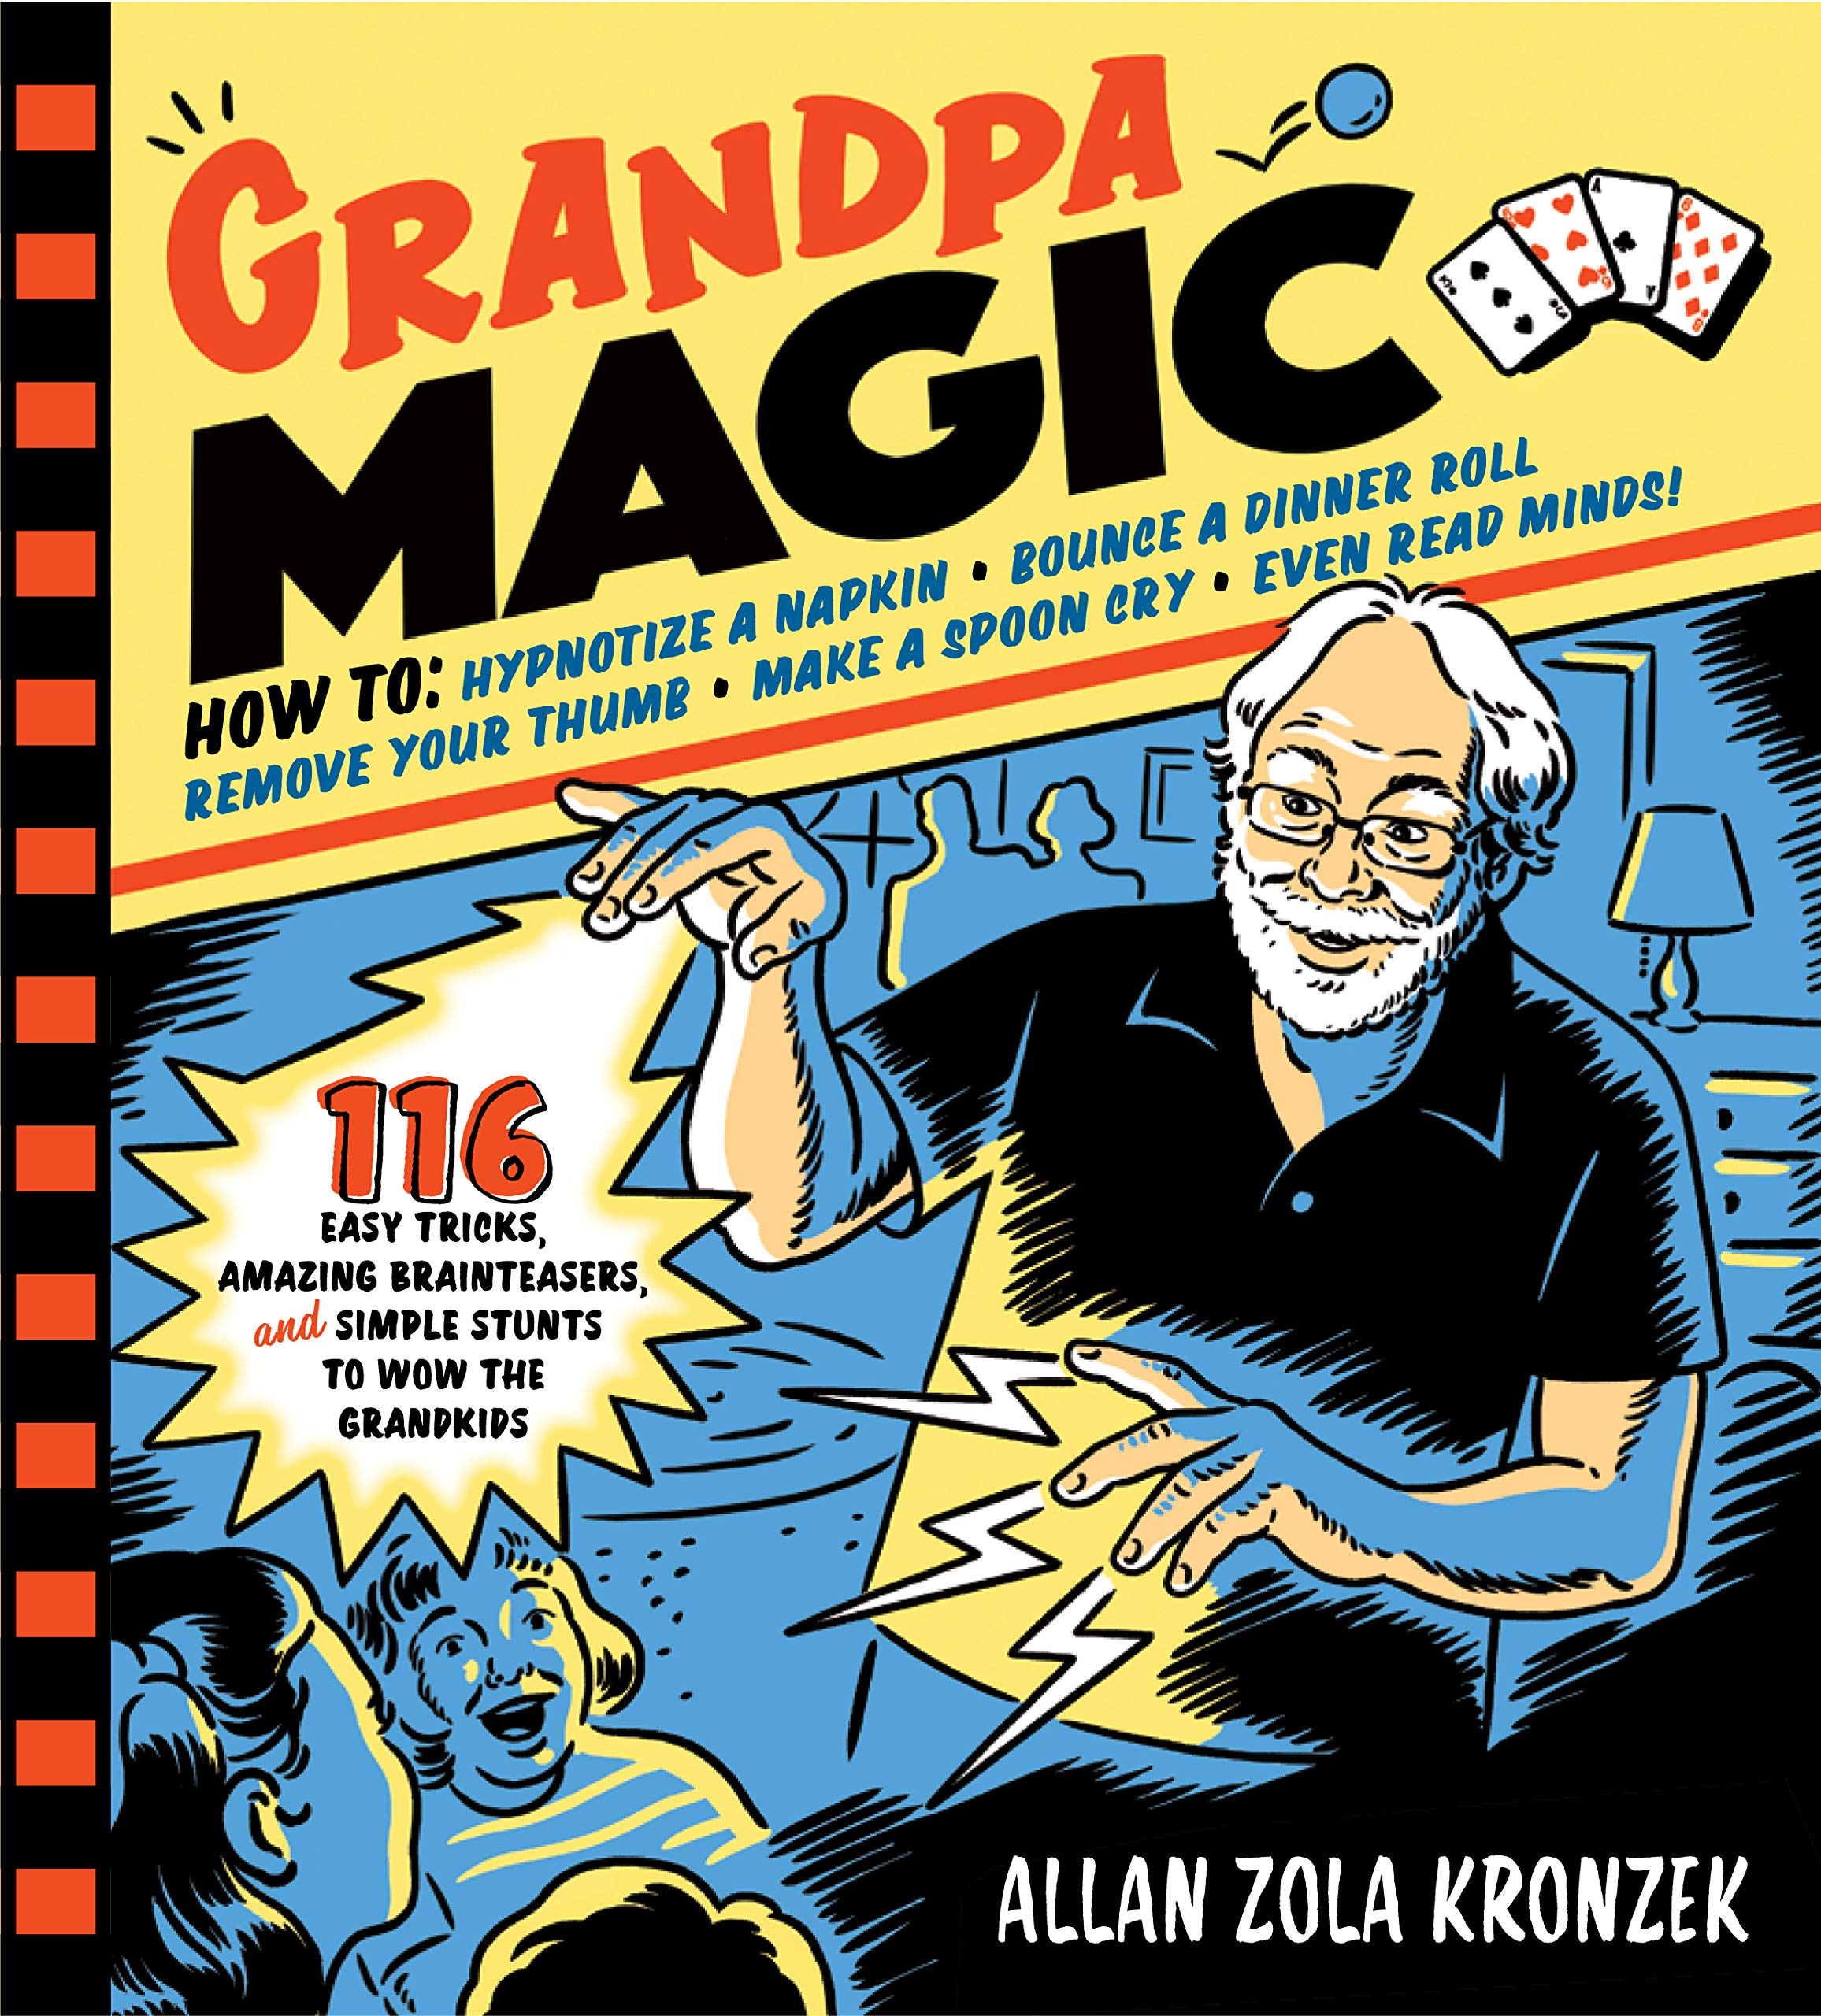 Grandpa Magic: 116 Easy Tricks, Amazing Brainteasers, and Simple Stunts to  Wow the Grandkids: Allan Zola Kronzek: 9781523501052: Amazon.com: Books